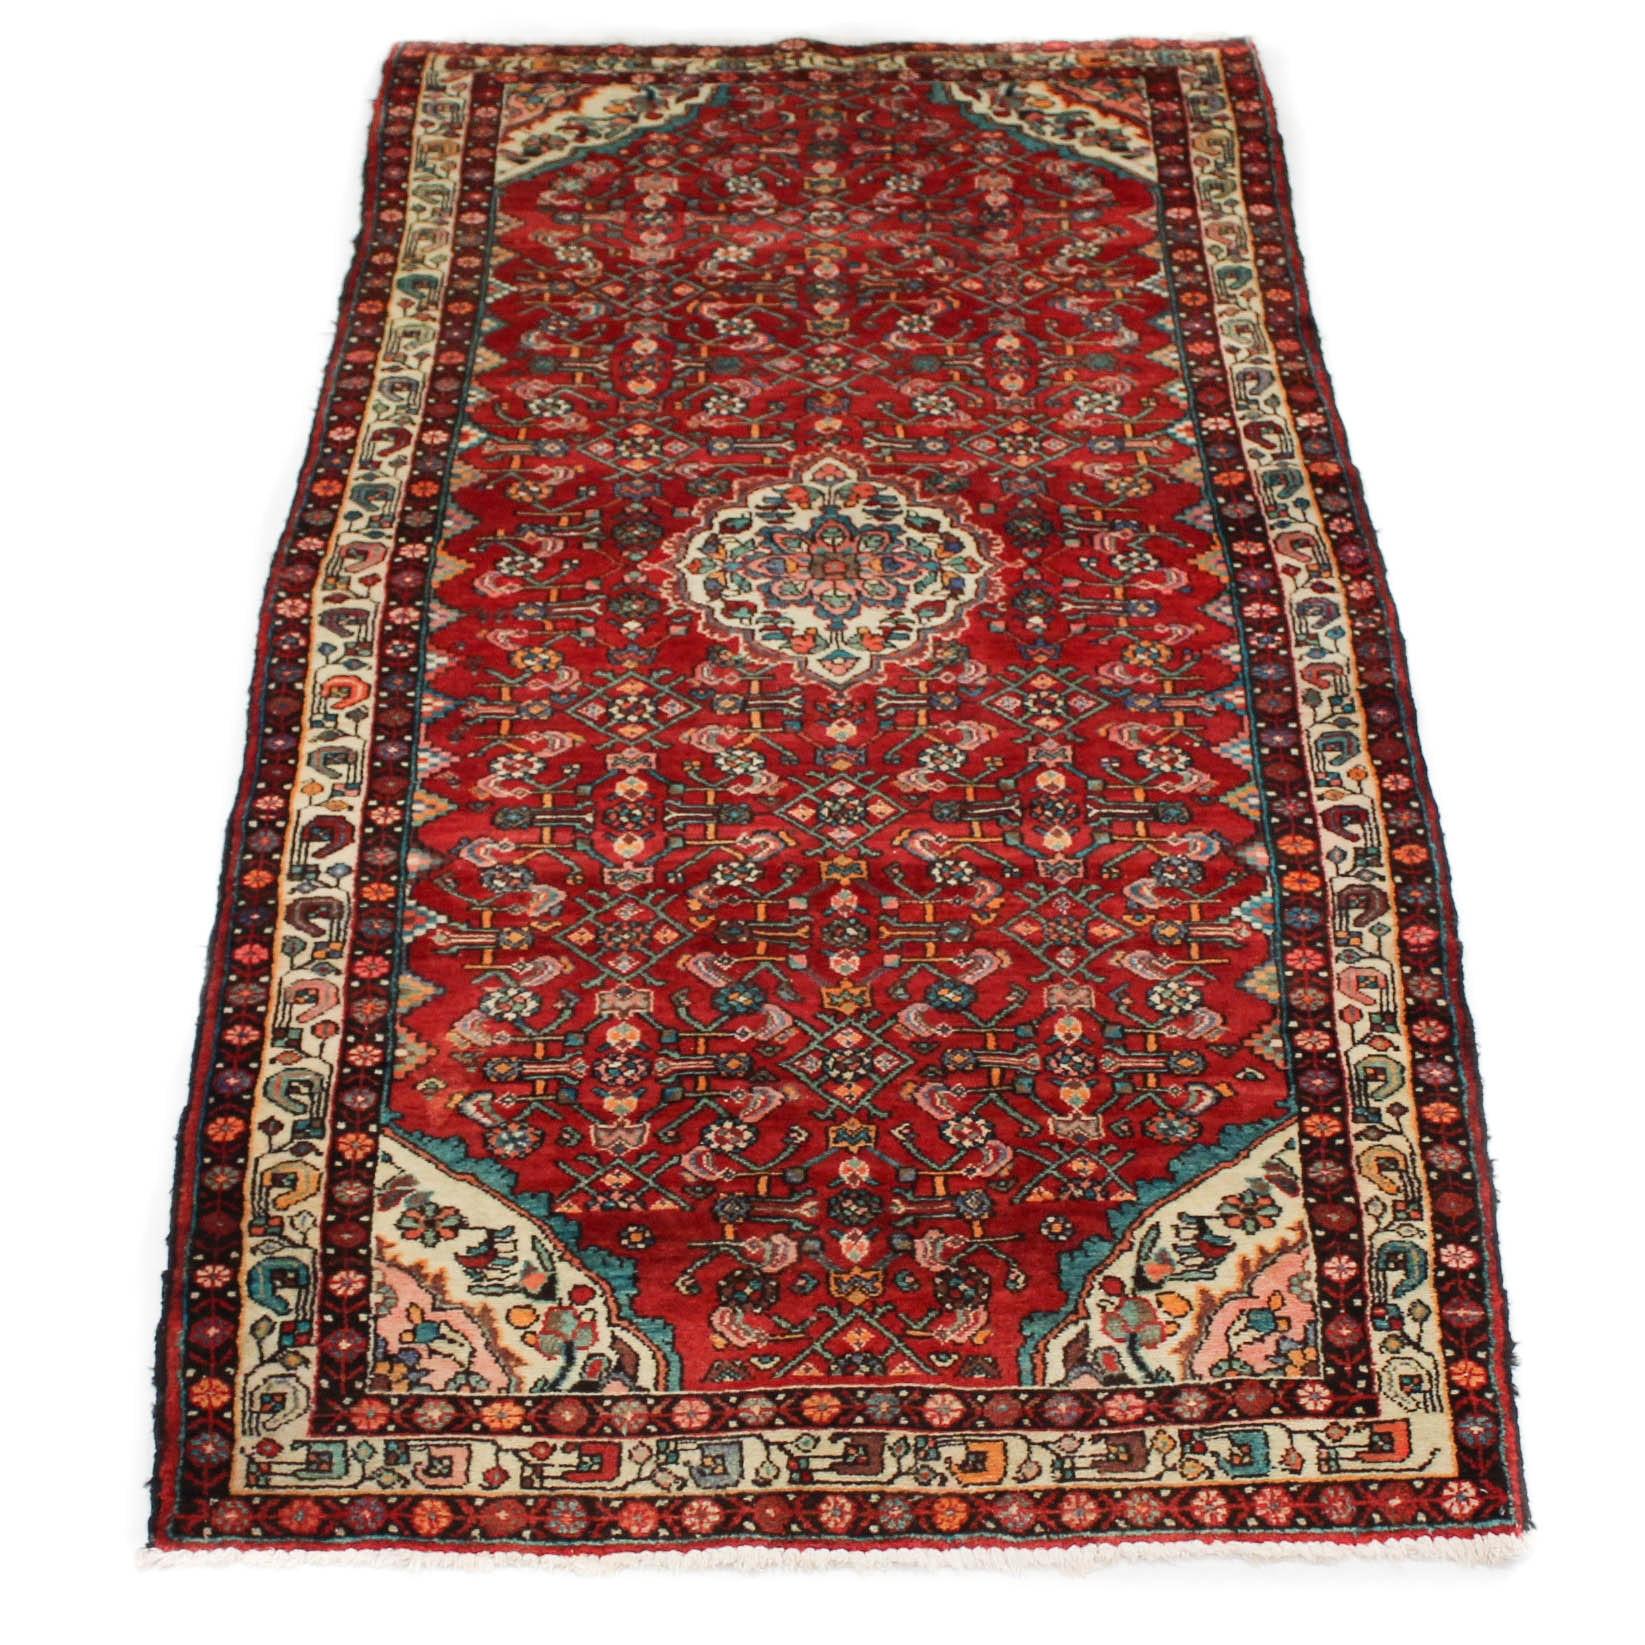 Semi-Antique Hand-Knotted Persian Zanjan Long Rug